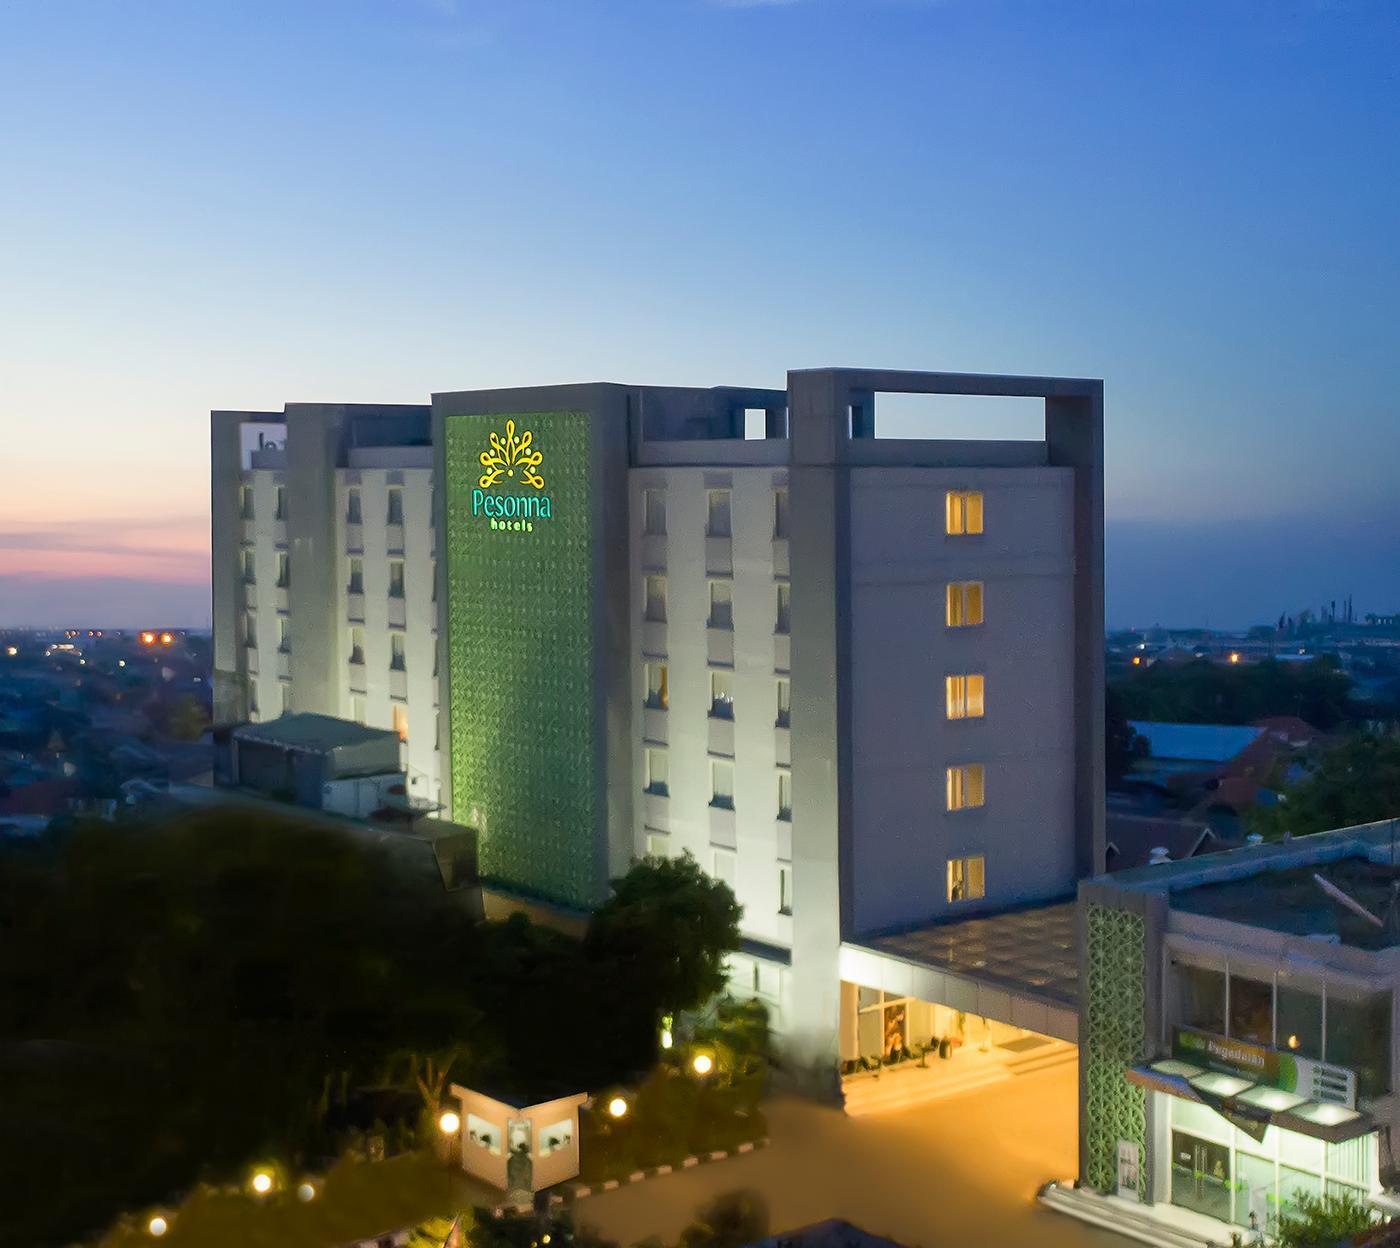 Hotel Pesonna Pekalongan